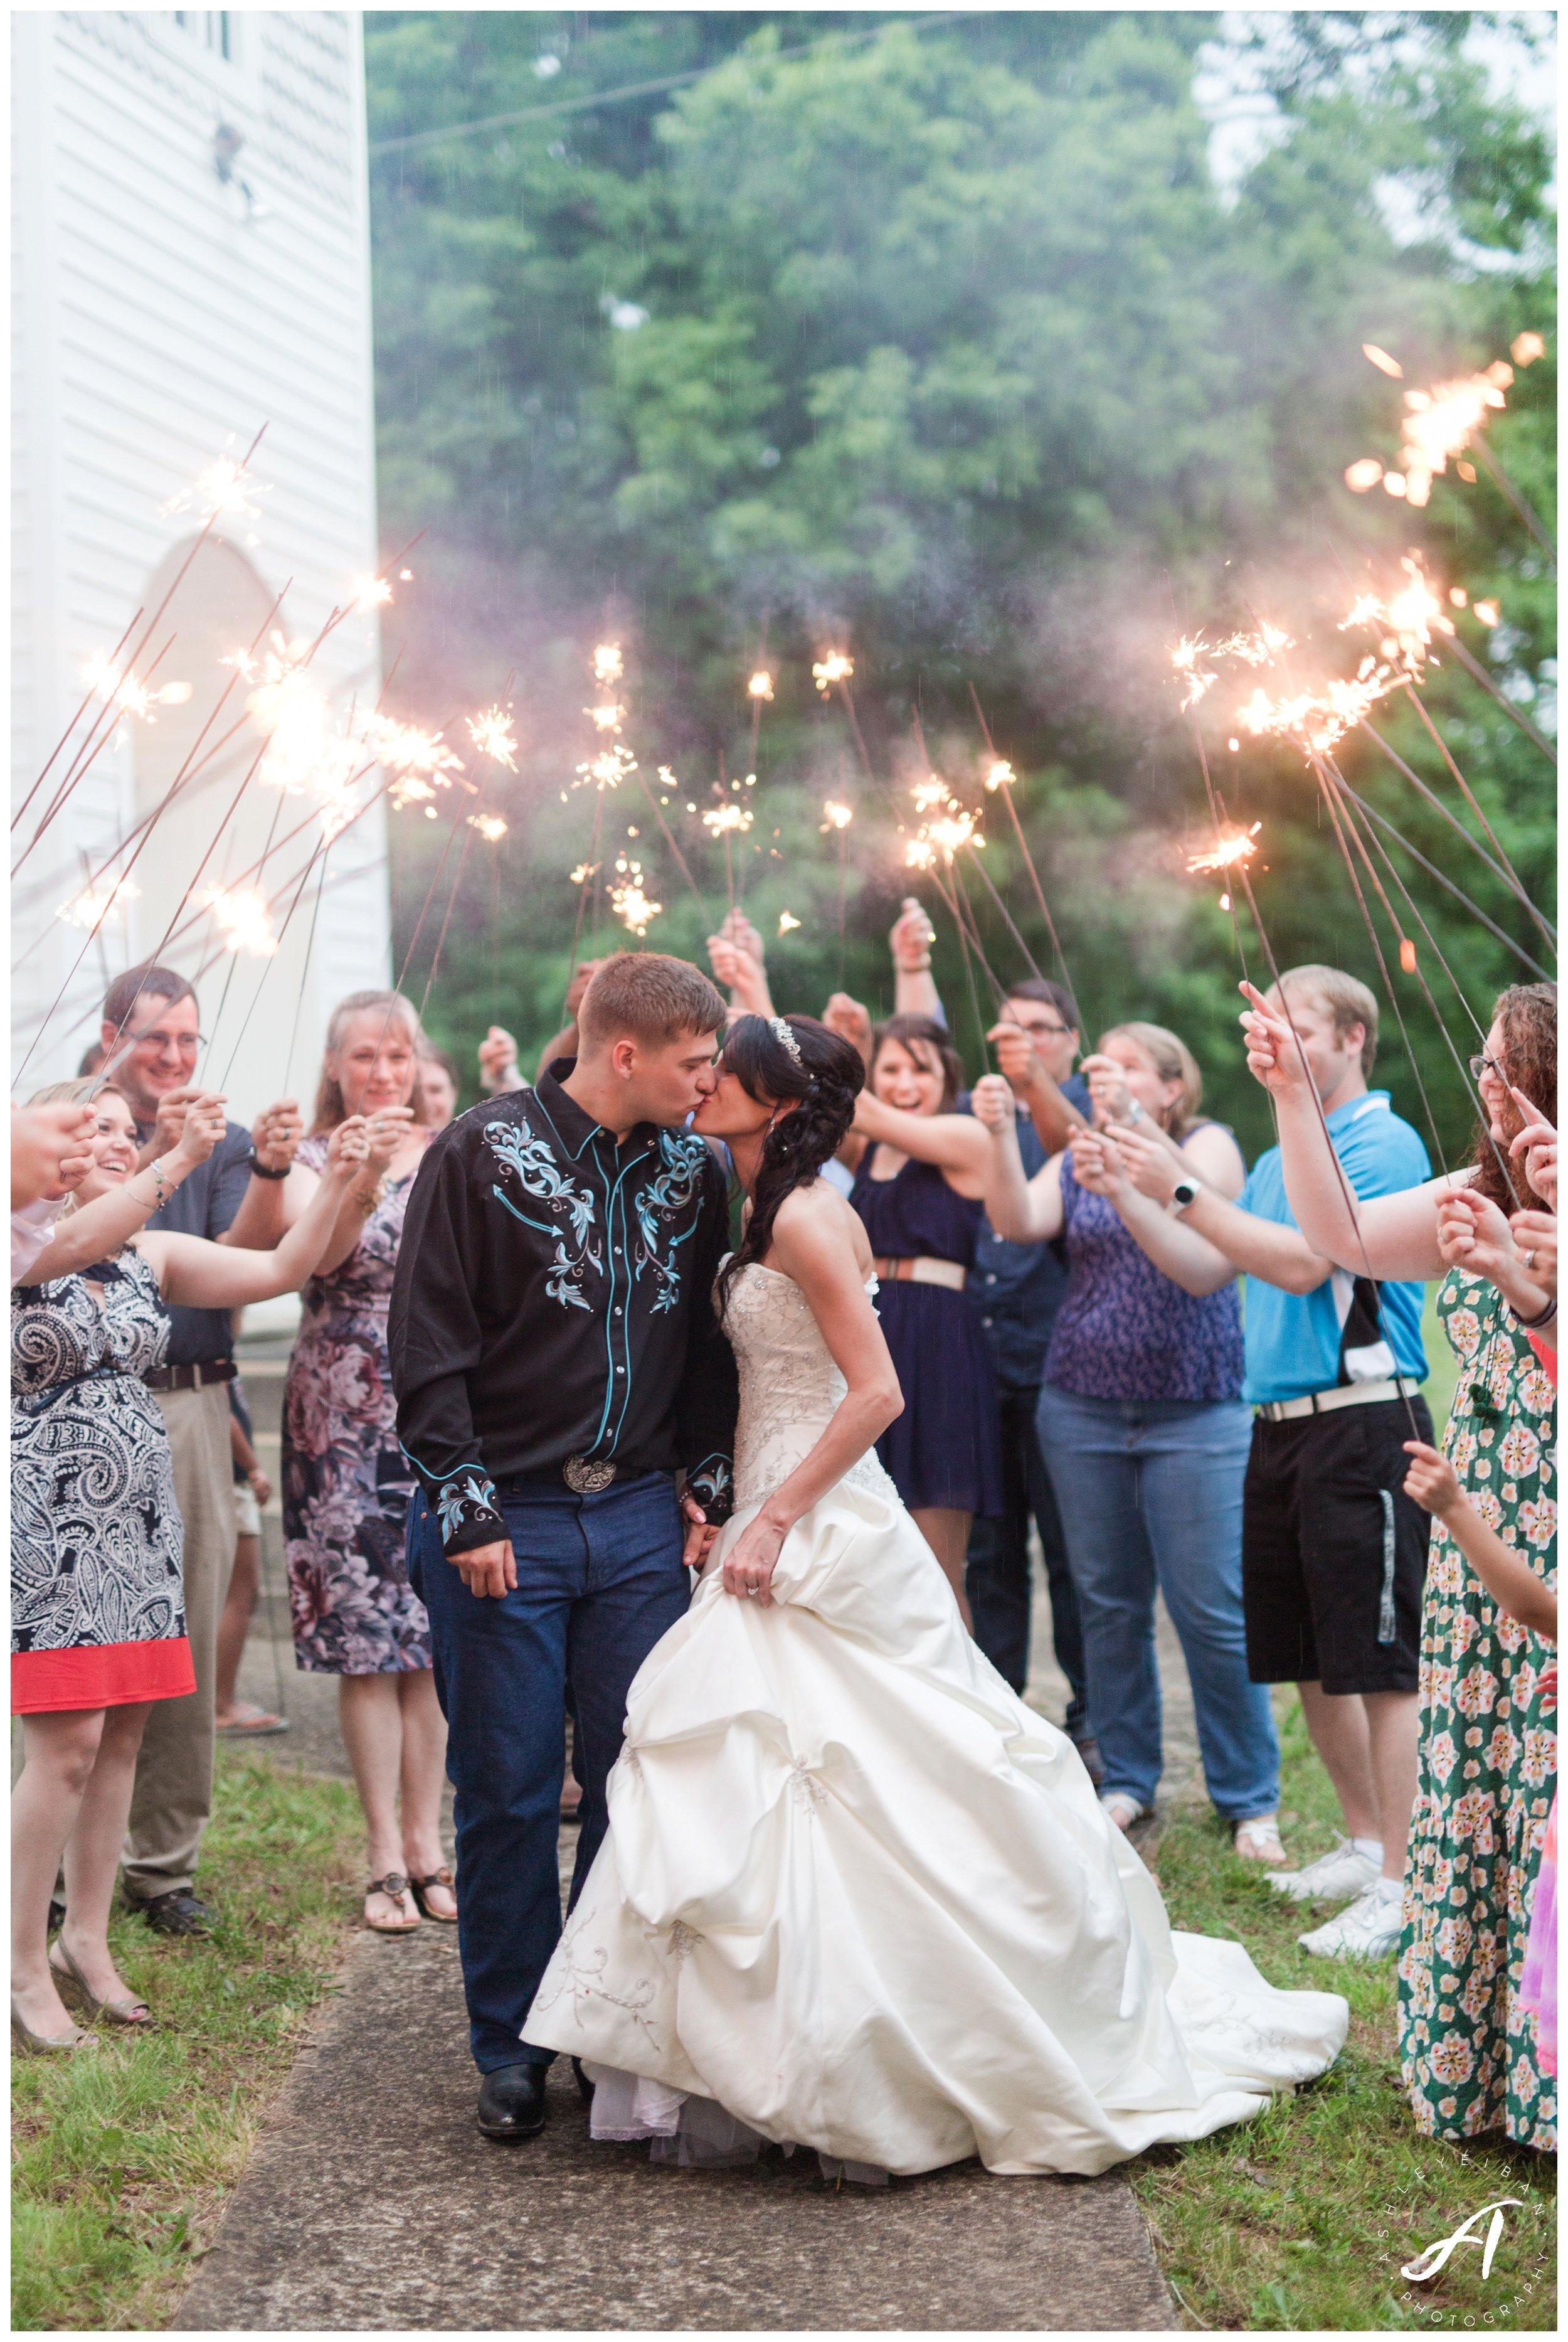 Lynchburg and Charlottesville Wedding Photographer || www.ashleyeiban.com